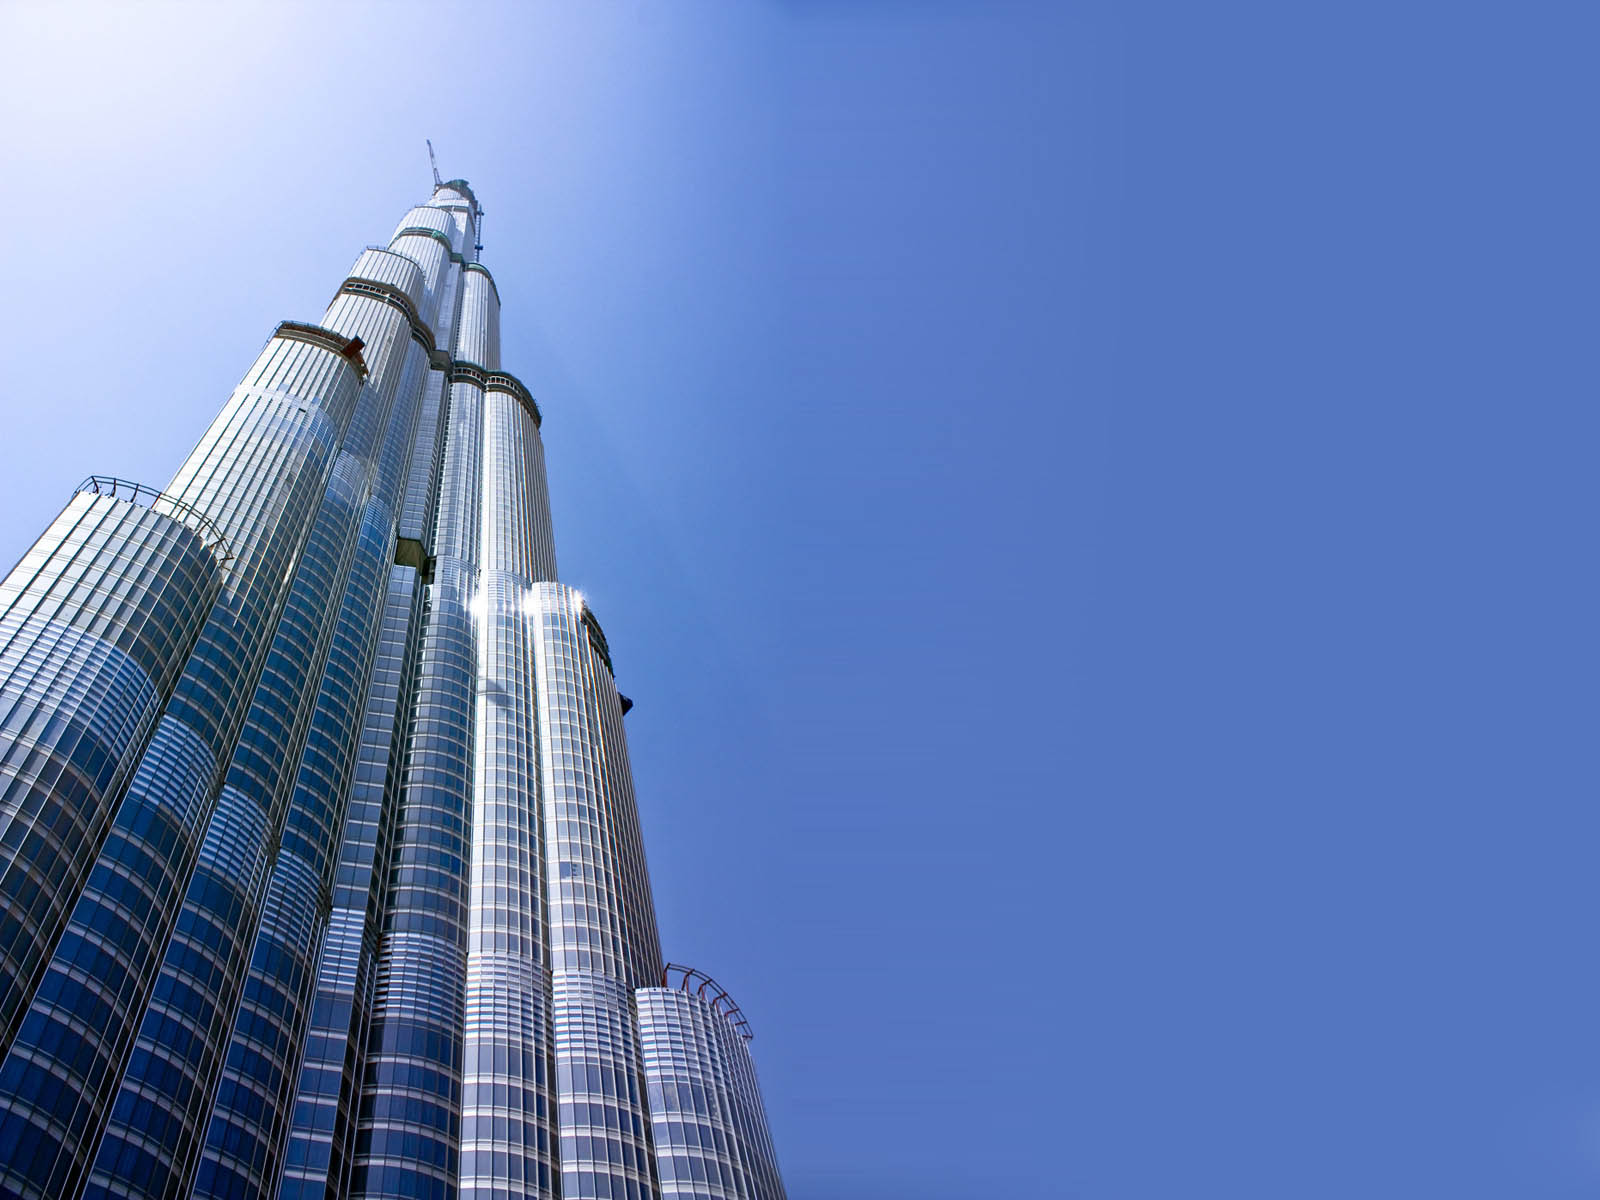 World largest tower downtown burj dubai 2013 wallpapers - Dubai burj khalifa hd photos ...